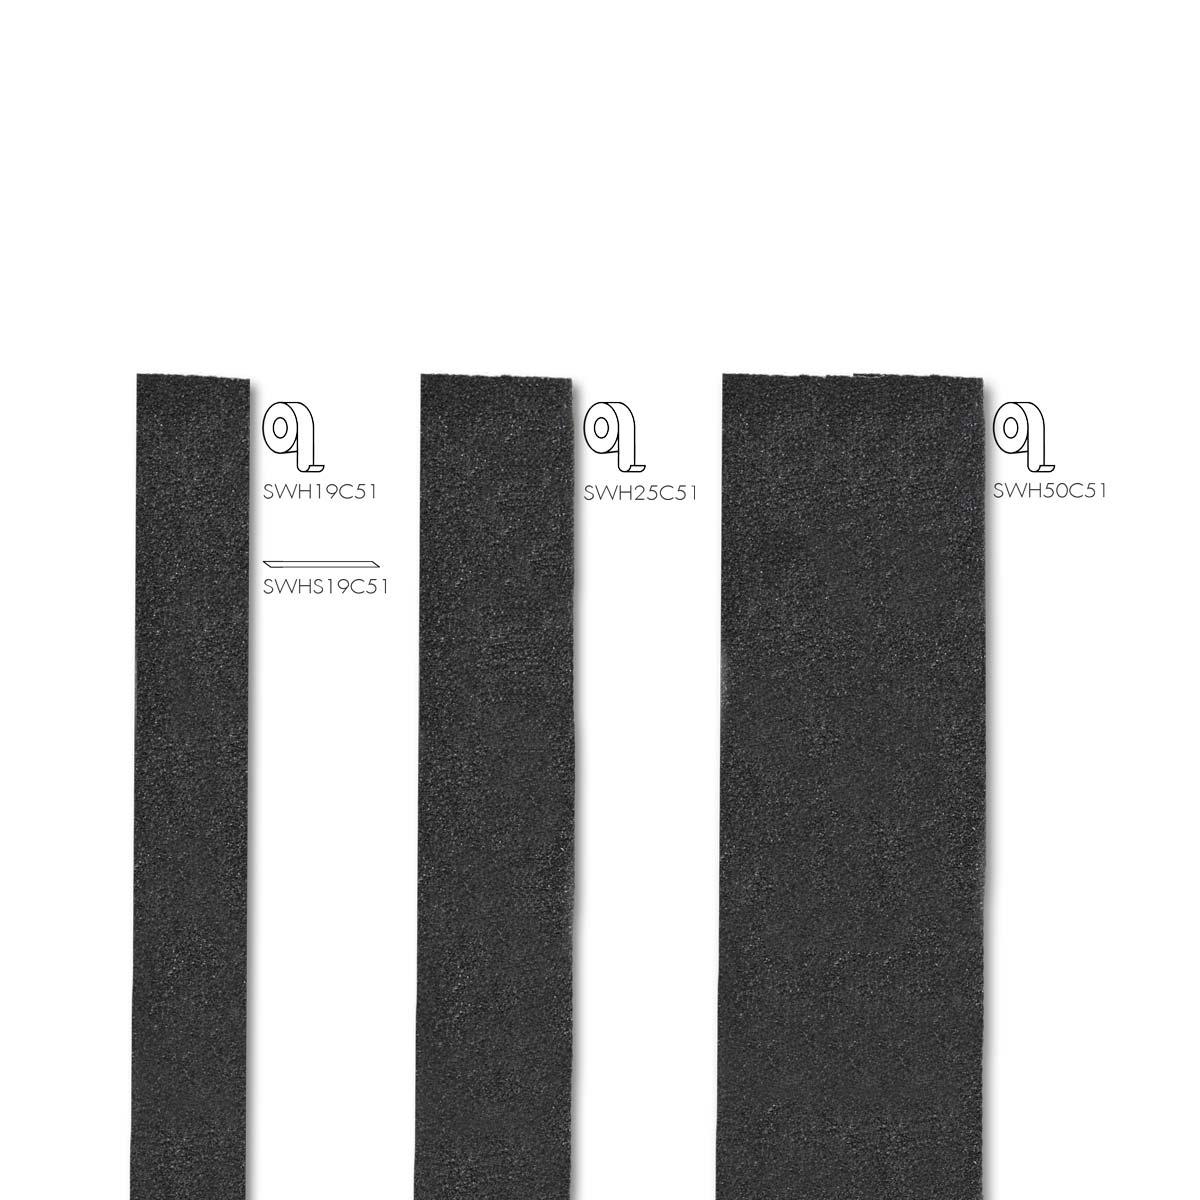 Profili per gradini Walktec SWH C51Profilitec